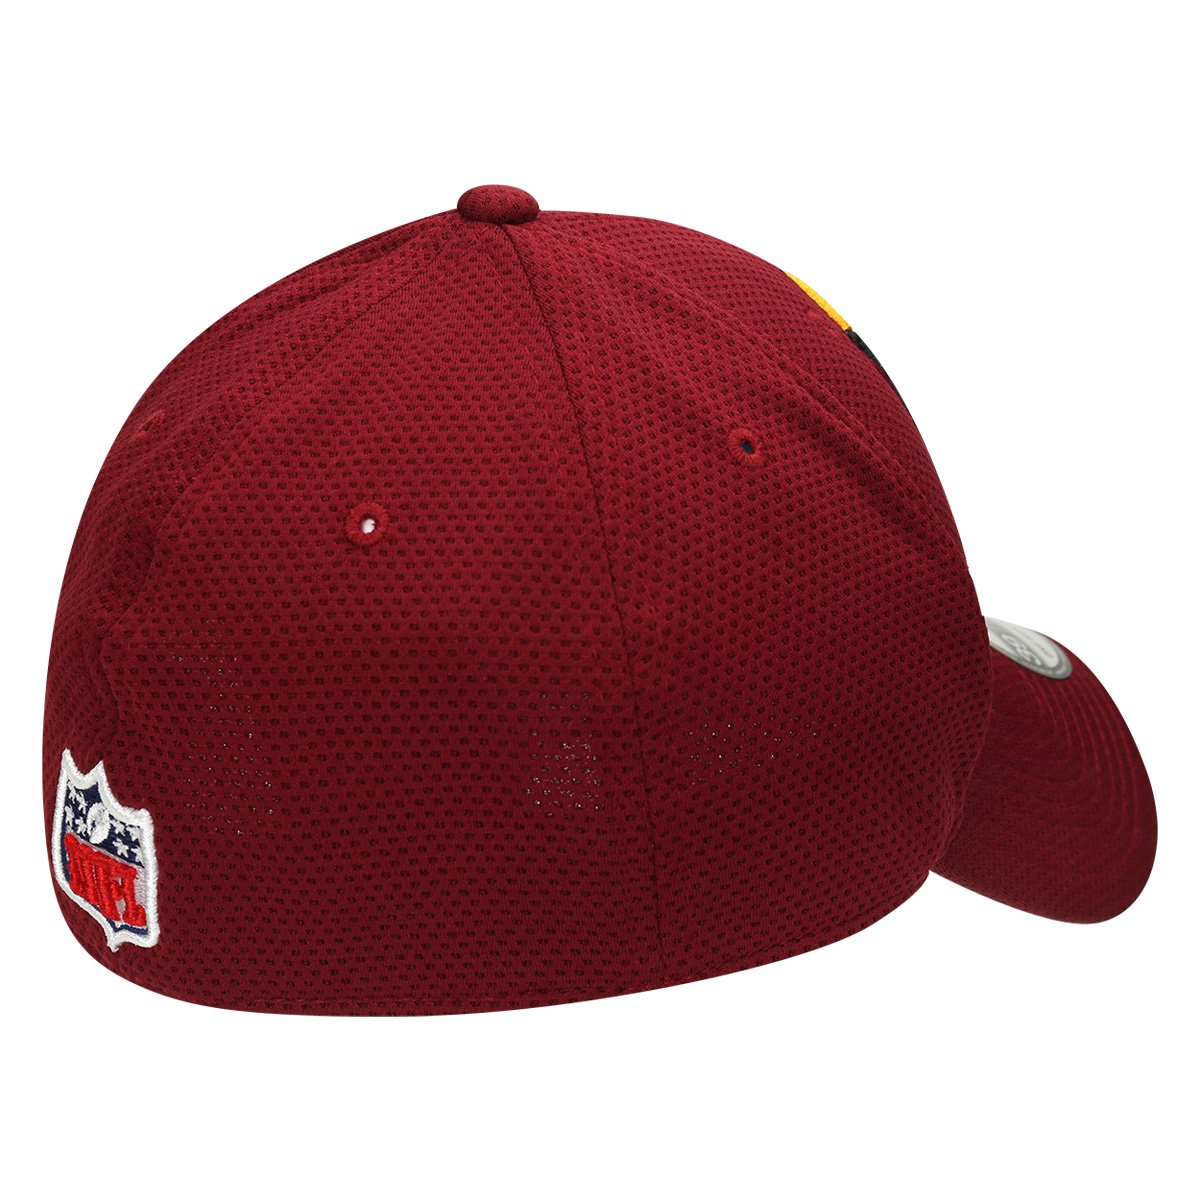 Boné New Era NFL 3930 Sideline Tech Washington Red Skins - Compre ... 675da1e9dba